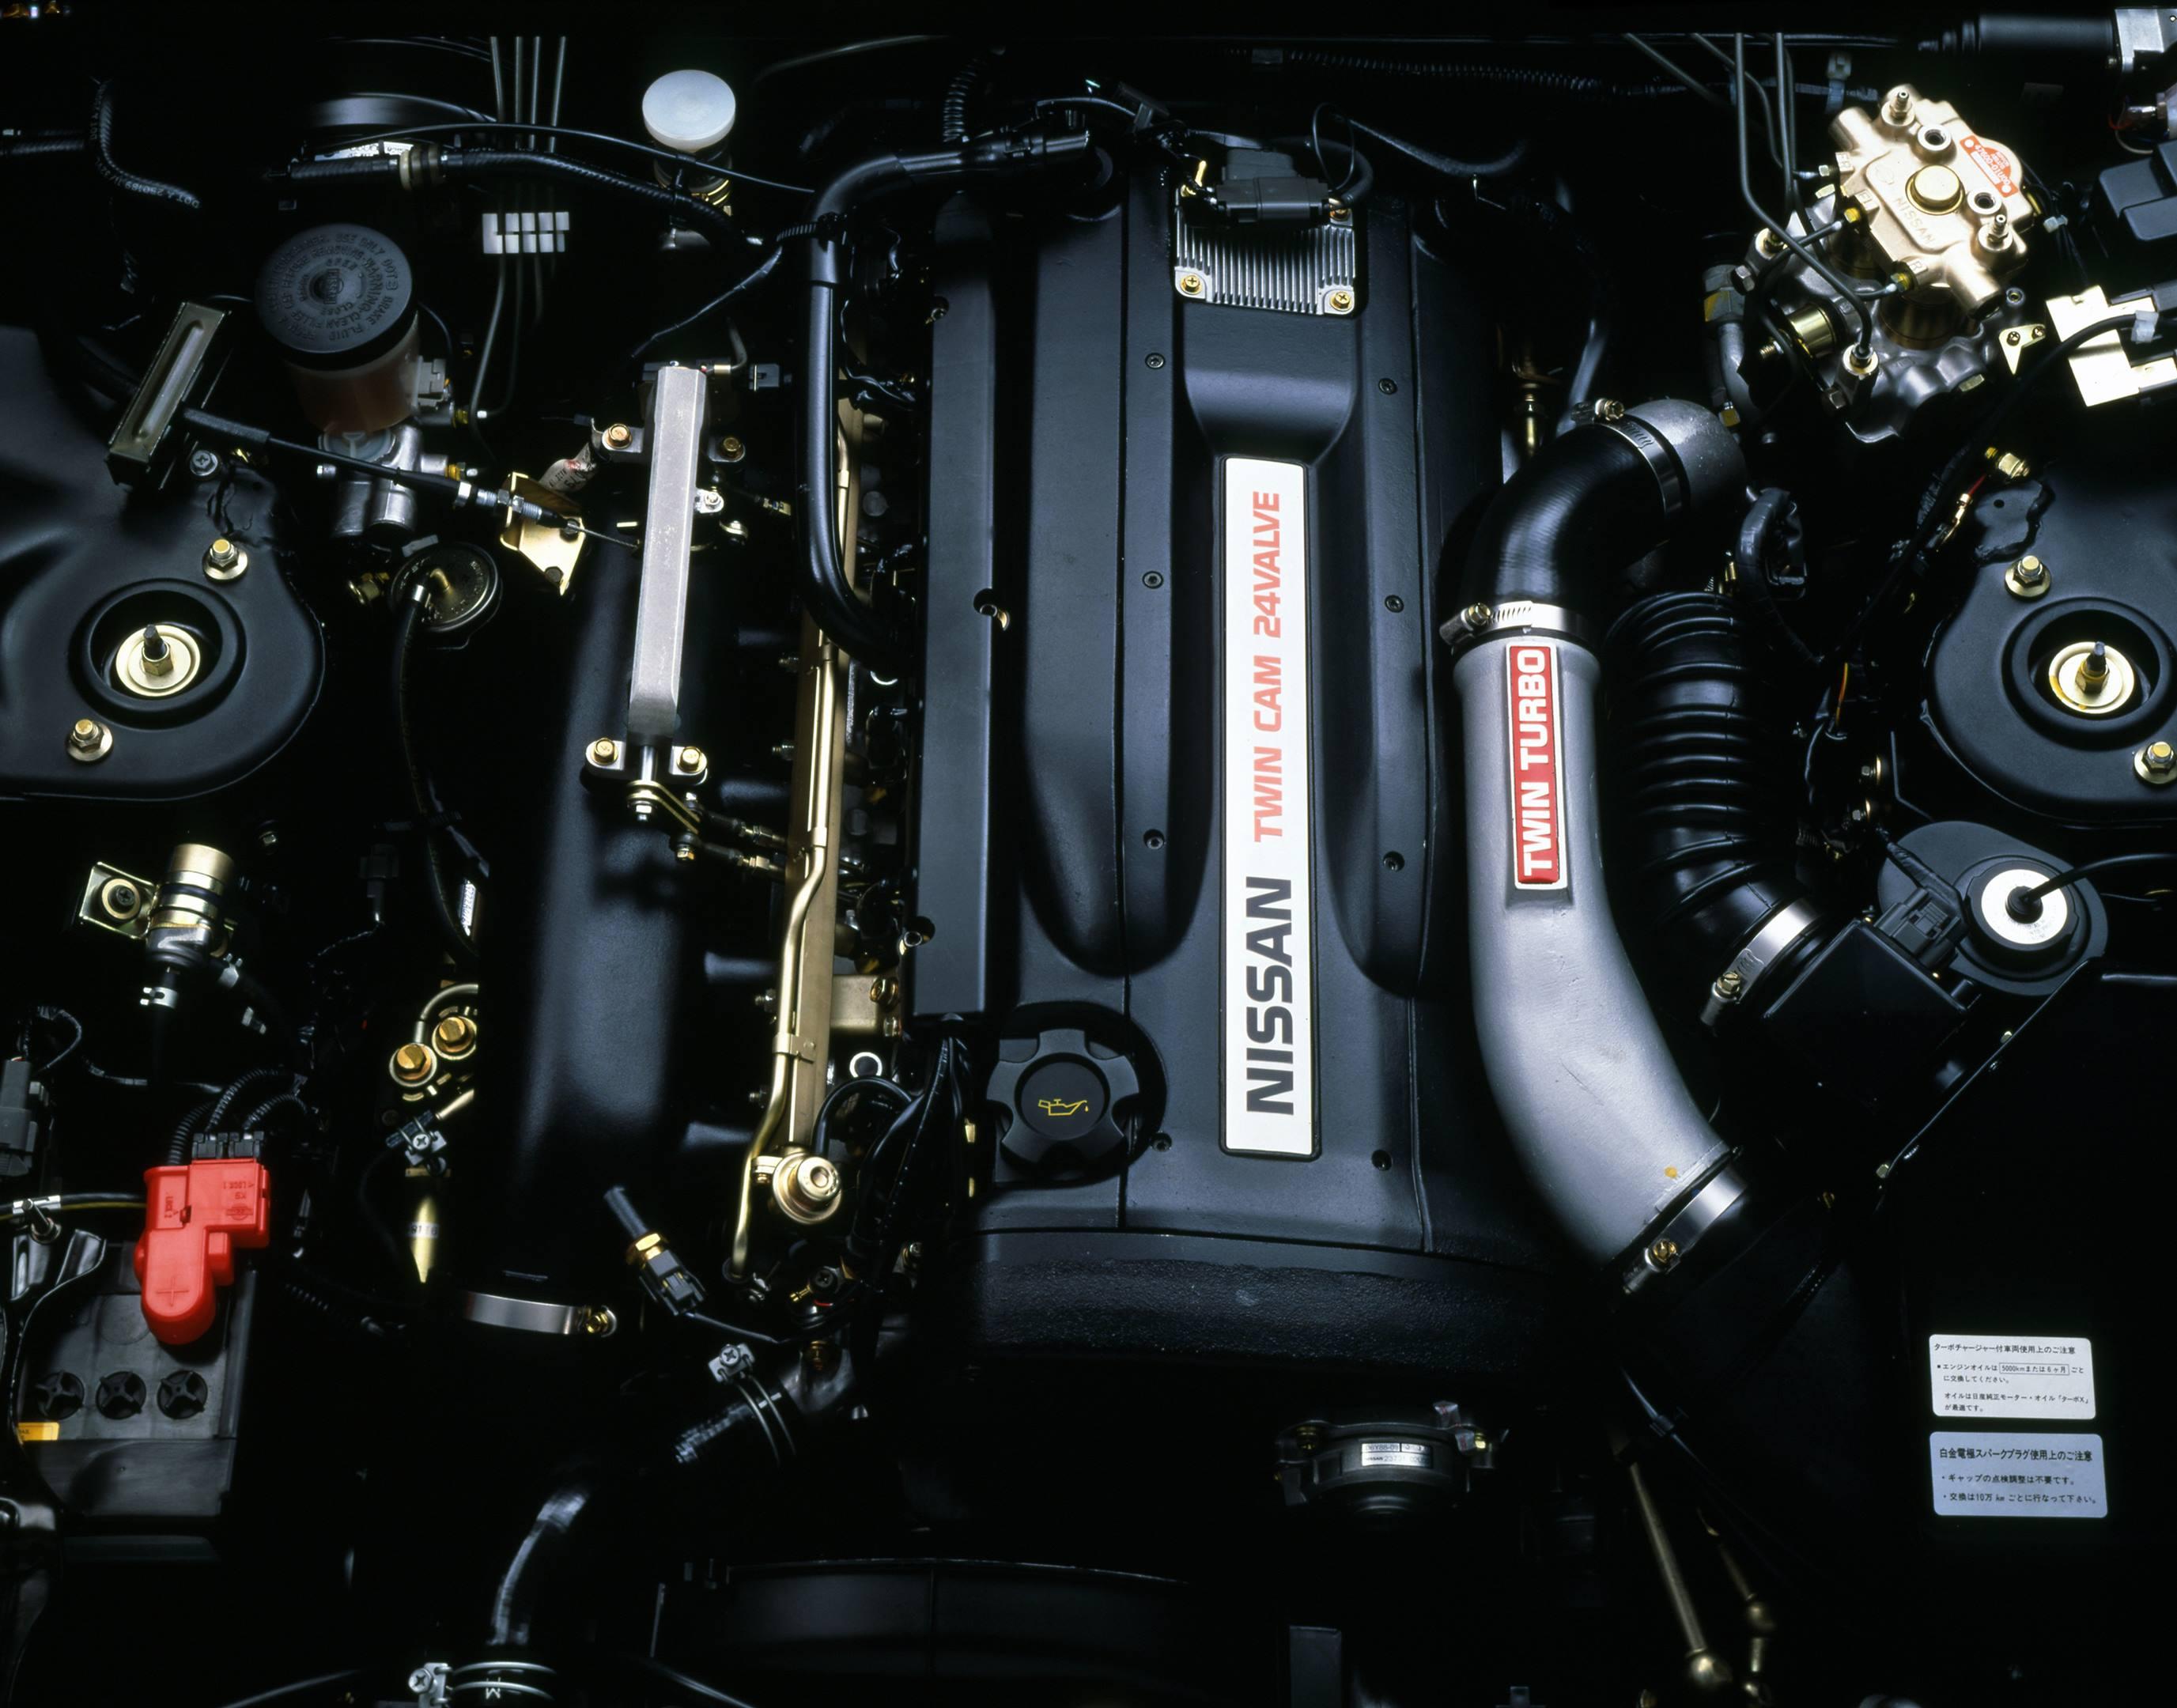 Nissan RB26DETT gt-r engine turbo